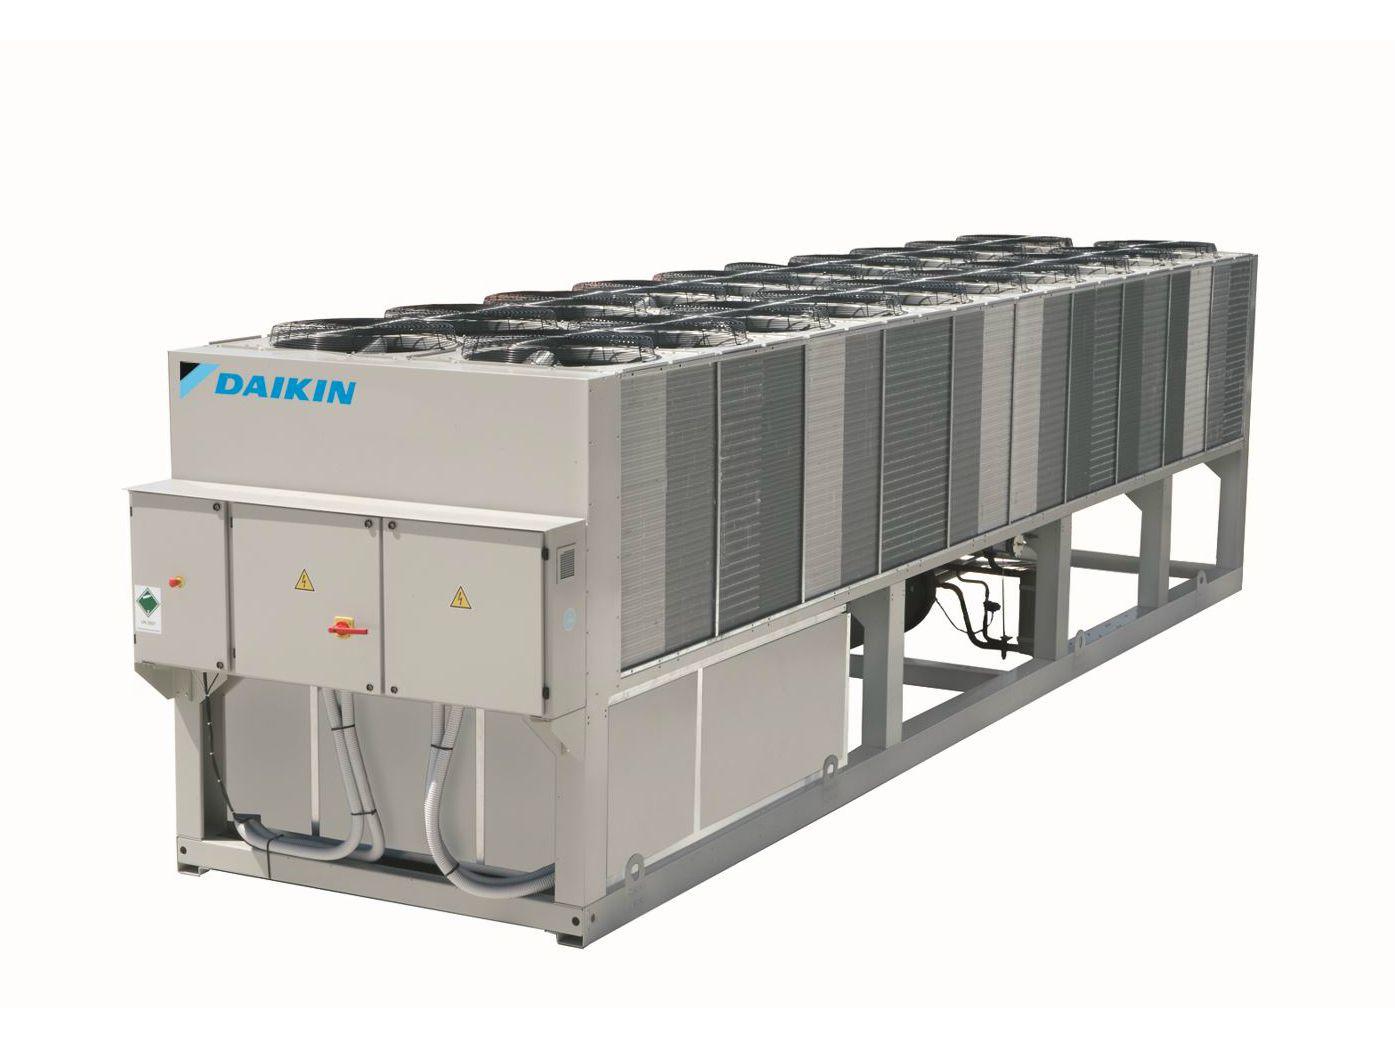 Ewad C Air Refrigeration Unit By Daikin Air Conditioning Italy